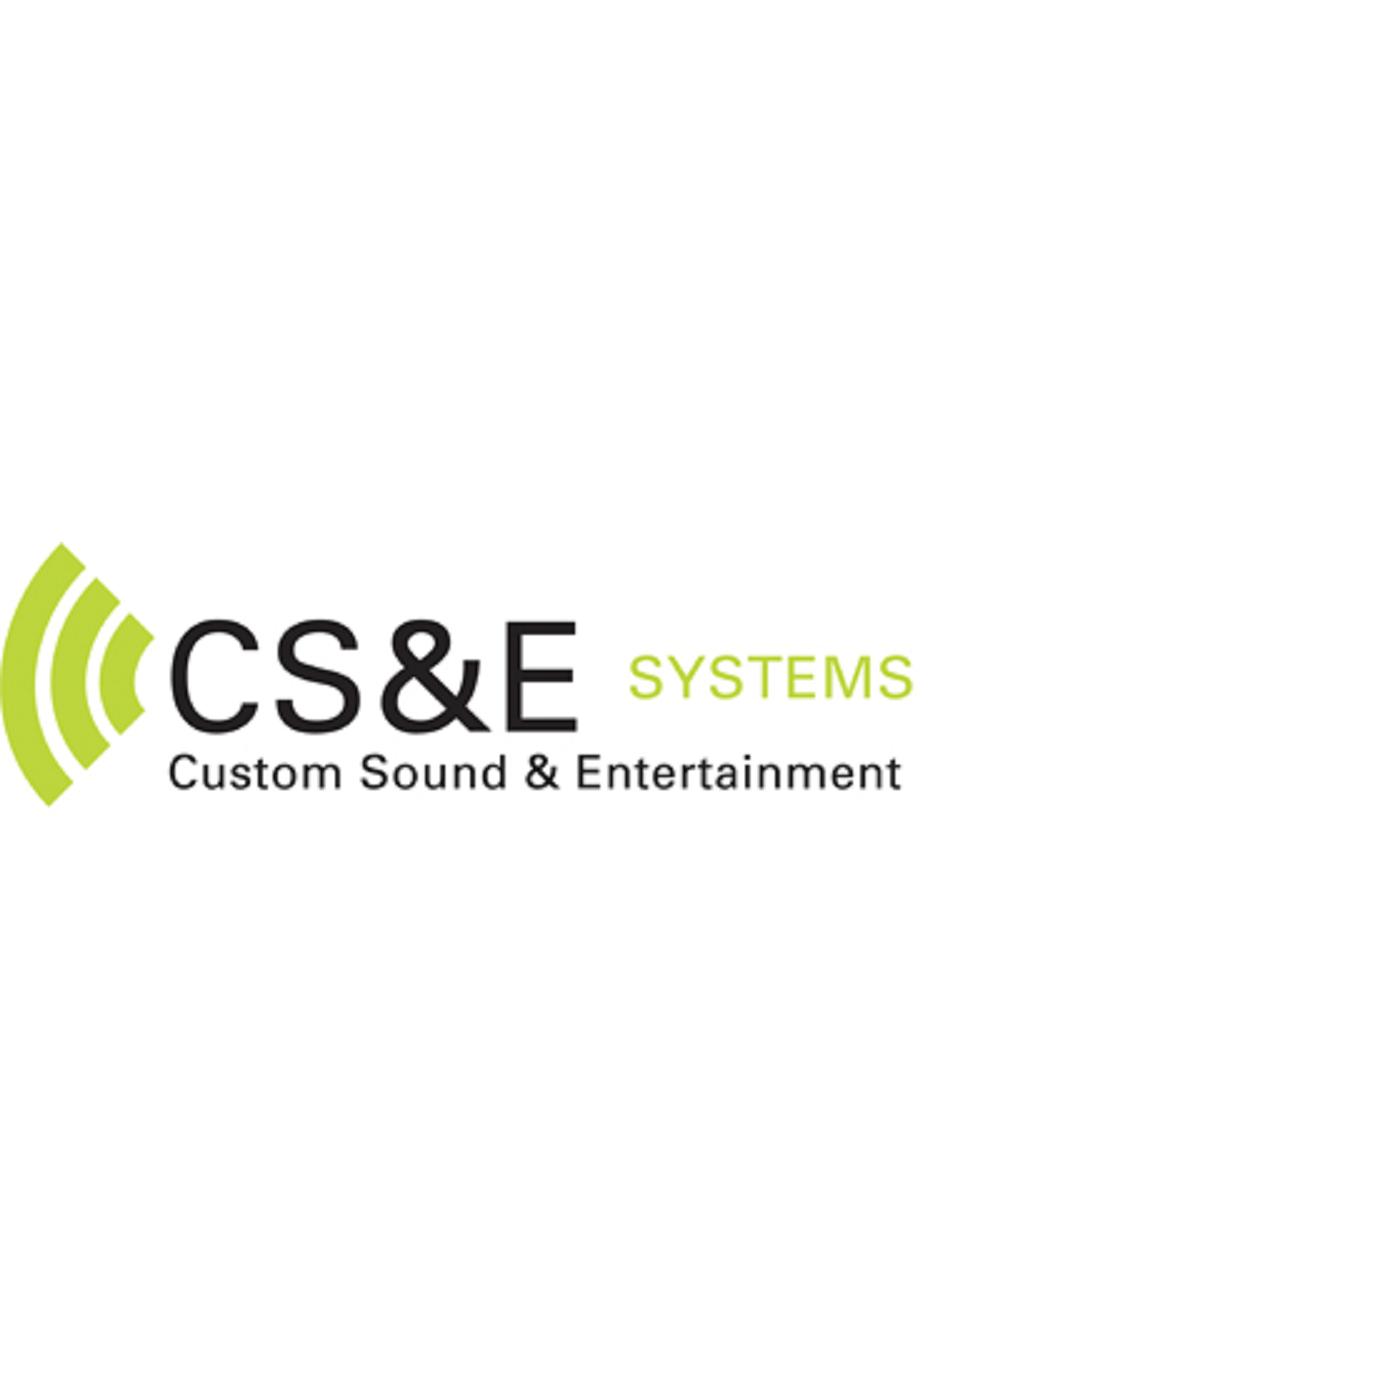 CS&E Systems